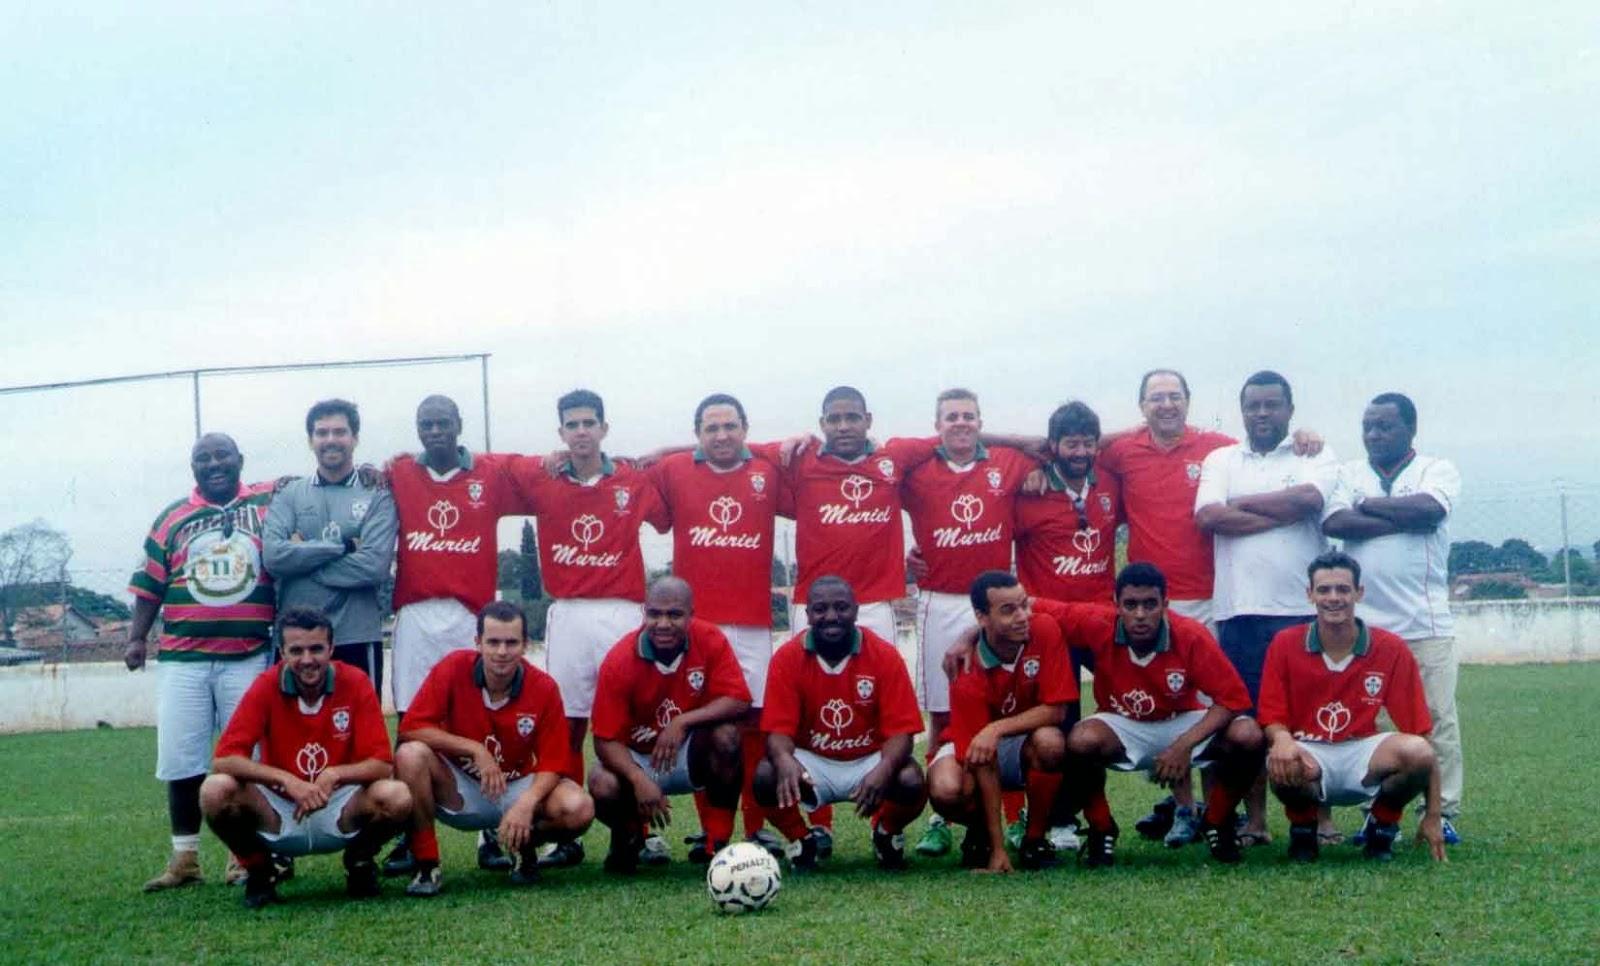 Vila Santa Isabel, futebol de várzea, Zona Leste de São Paulo, Vila Formosa, Vila Carrão